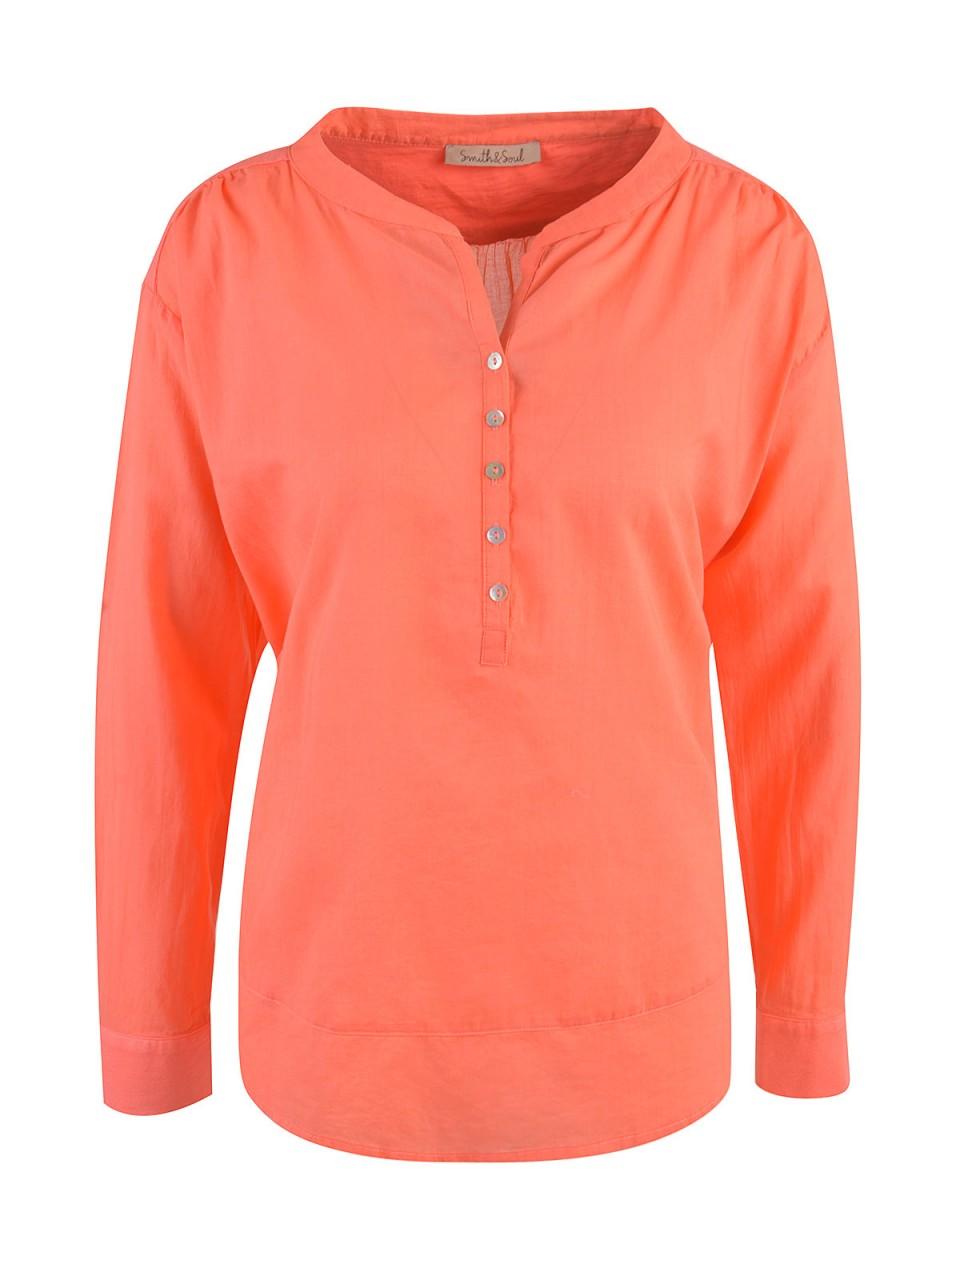 smith-amp-soul-damen-bluse-orange